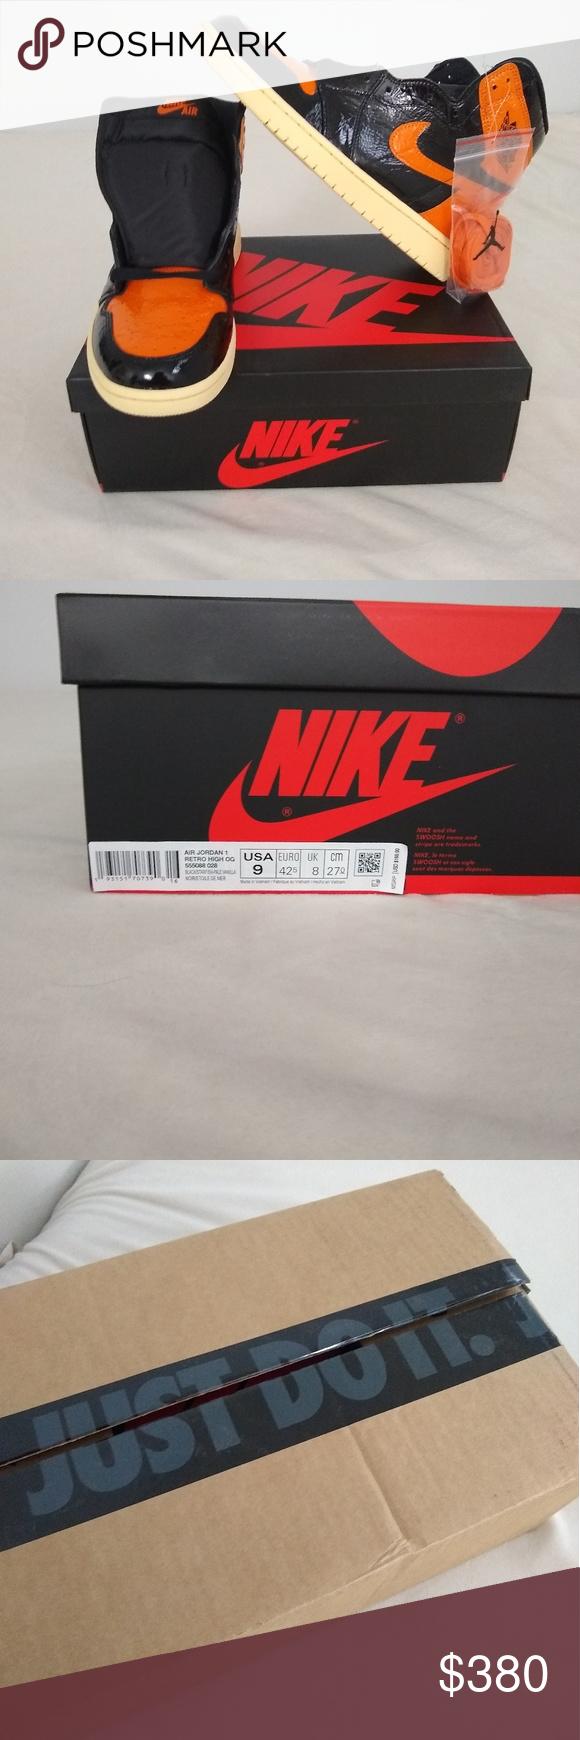 Nike Air Jordan Retro 1 Shattered Backboard 3.0 NWT Air